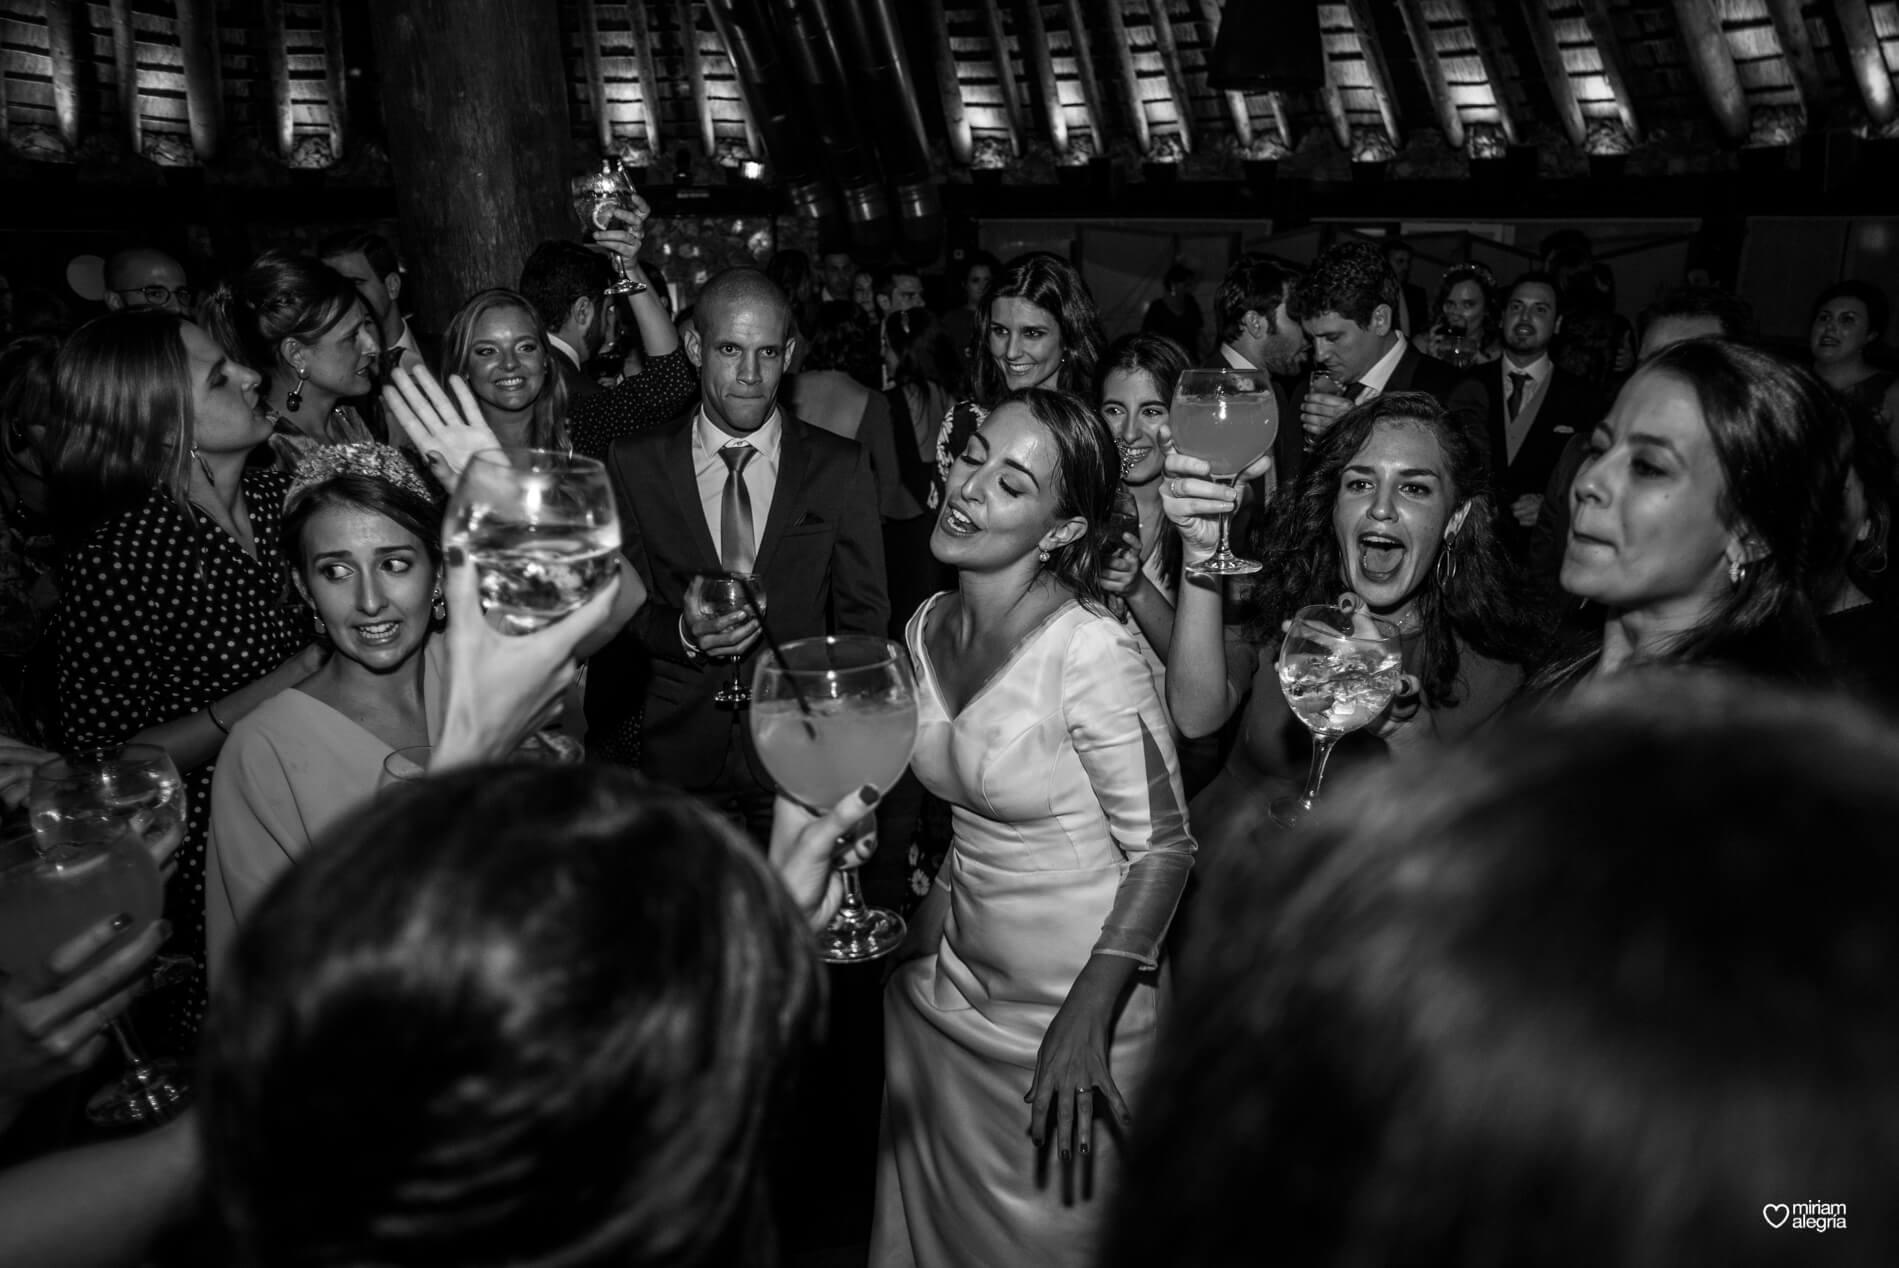 vestido-de-novia-paula-del-vas-miriam-alegria-fotografos-boda-murcia-189